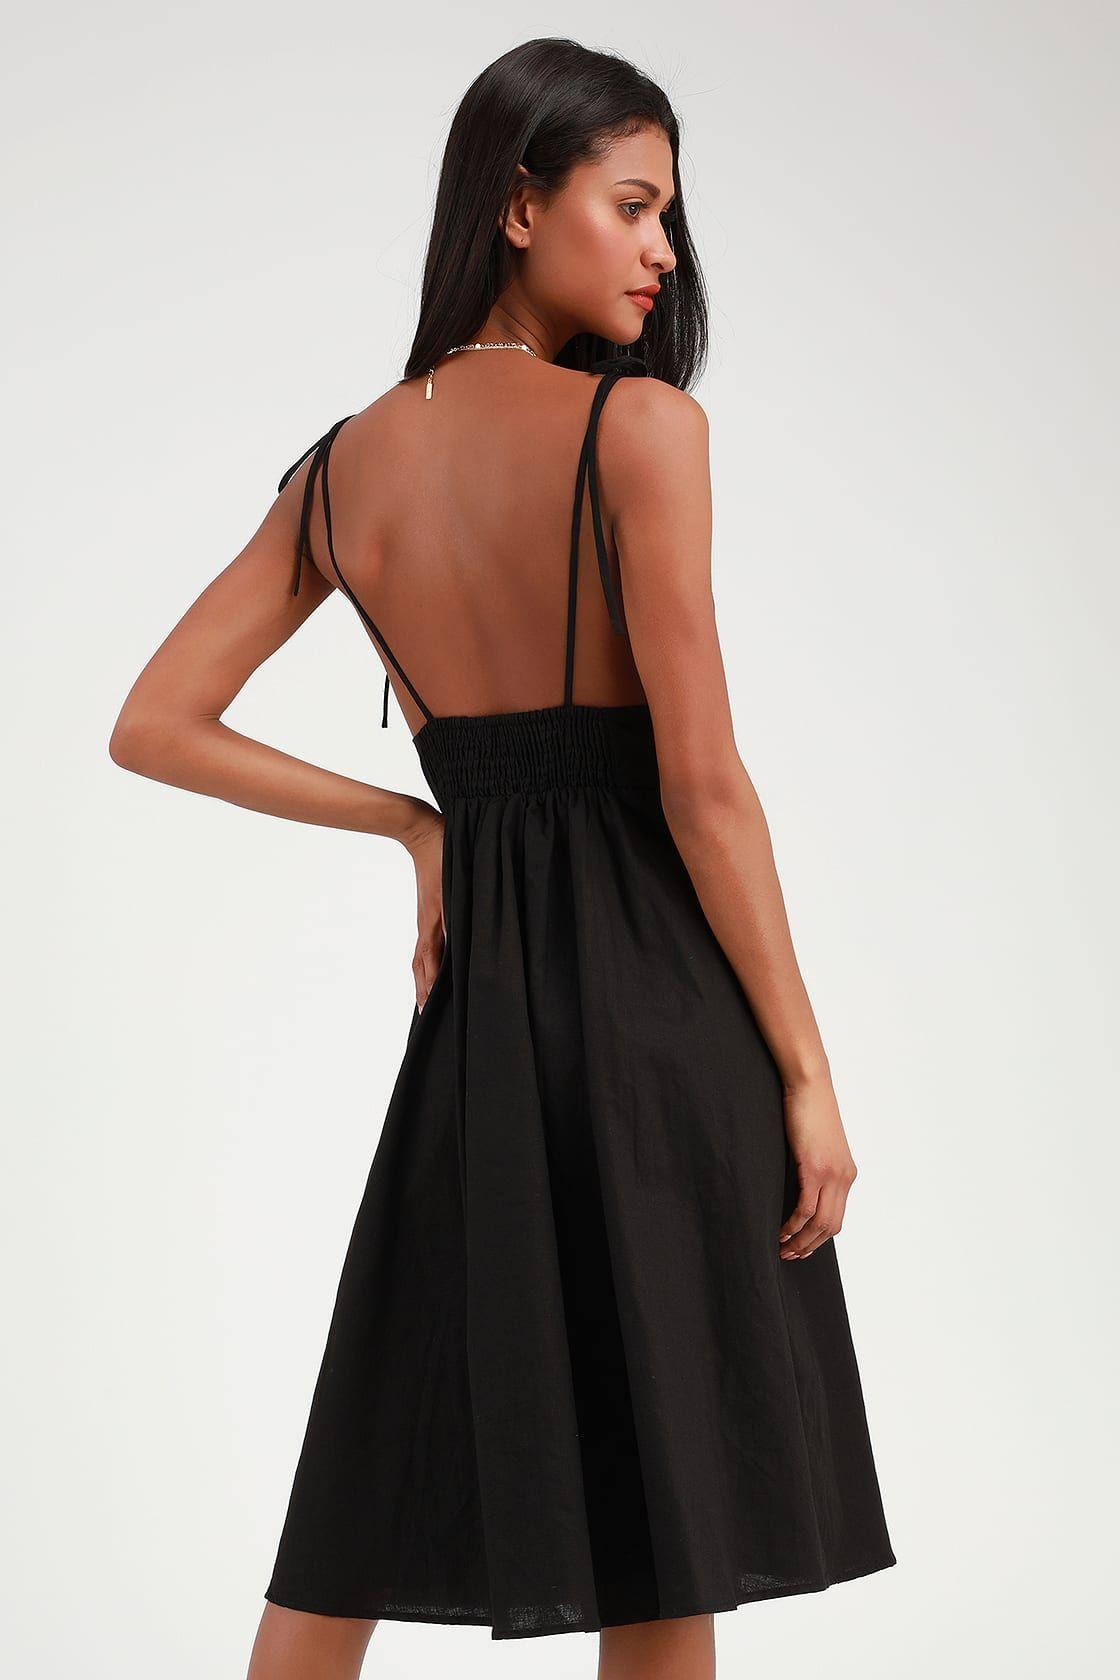 Style Refresh Black Midi Skater Dress Midi Skater Dress White Midi Dress Cute Black Dress [ 1680 x 1120 Pixel ]